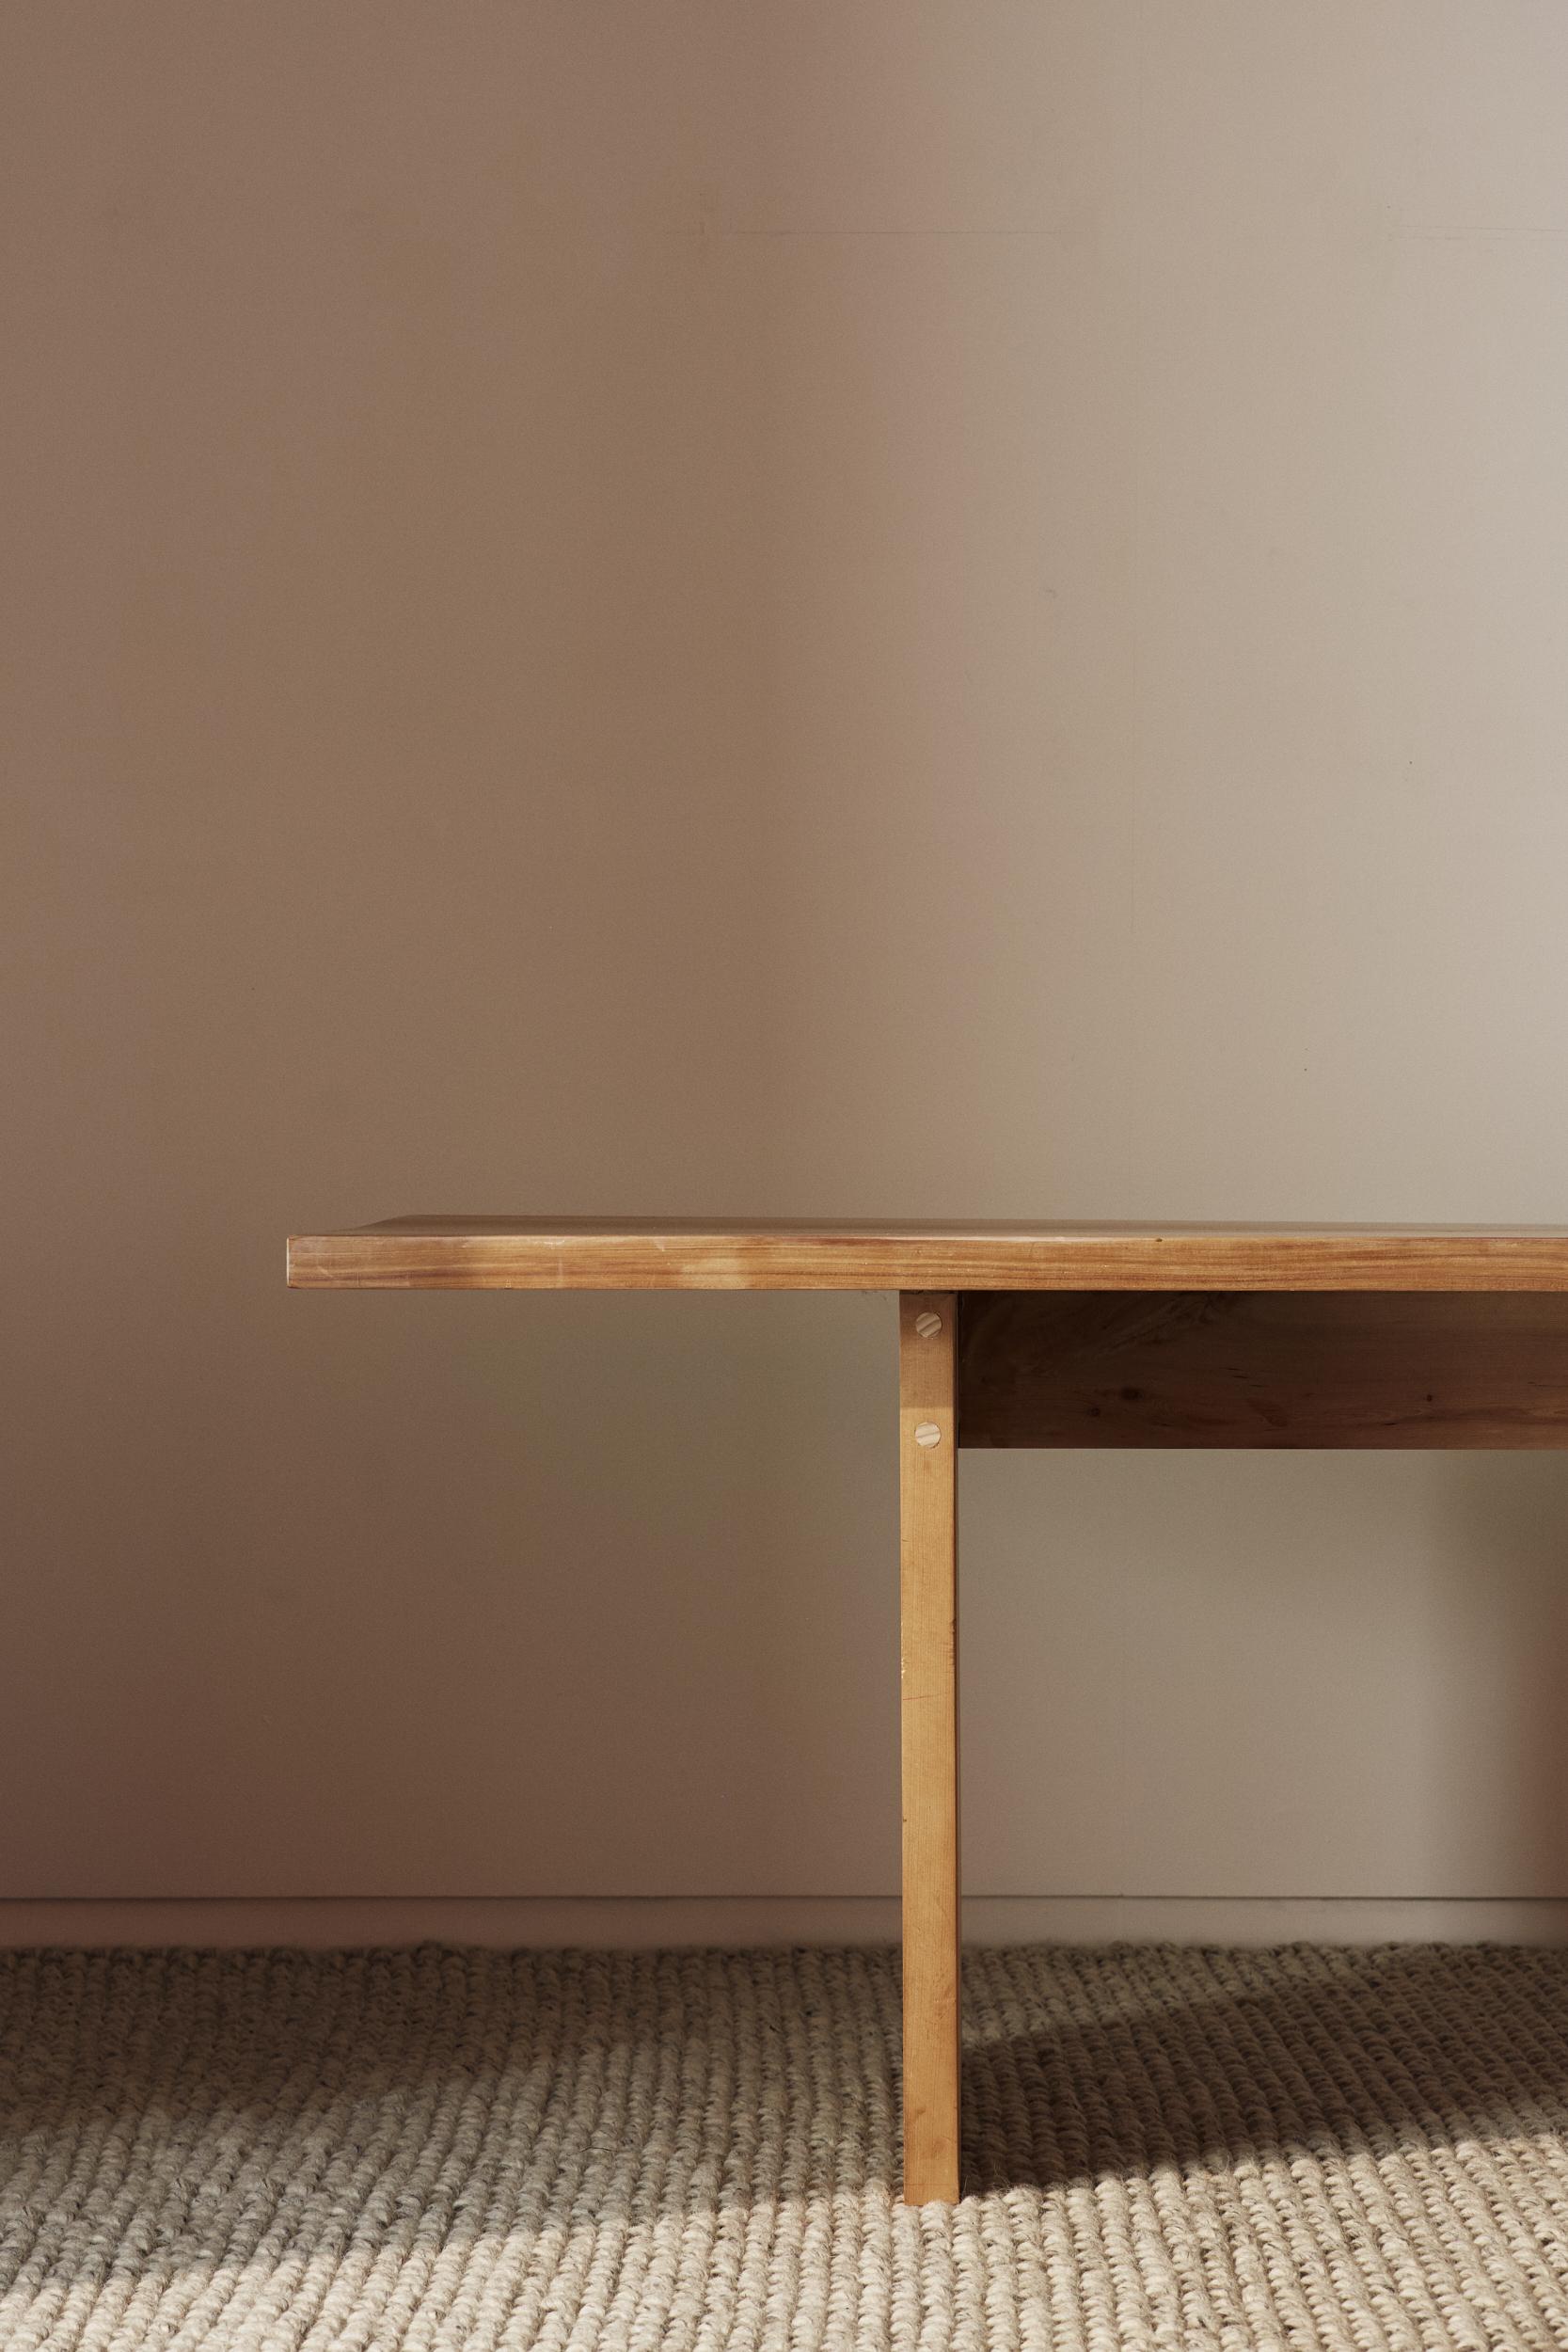 TABLE 01  Seear-Budd Ross Wellington, New Zealand